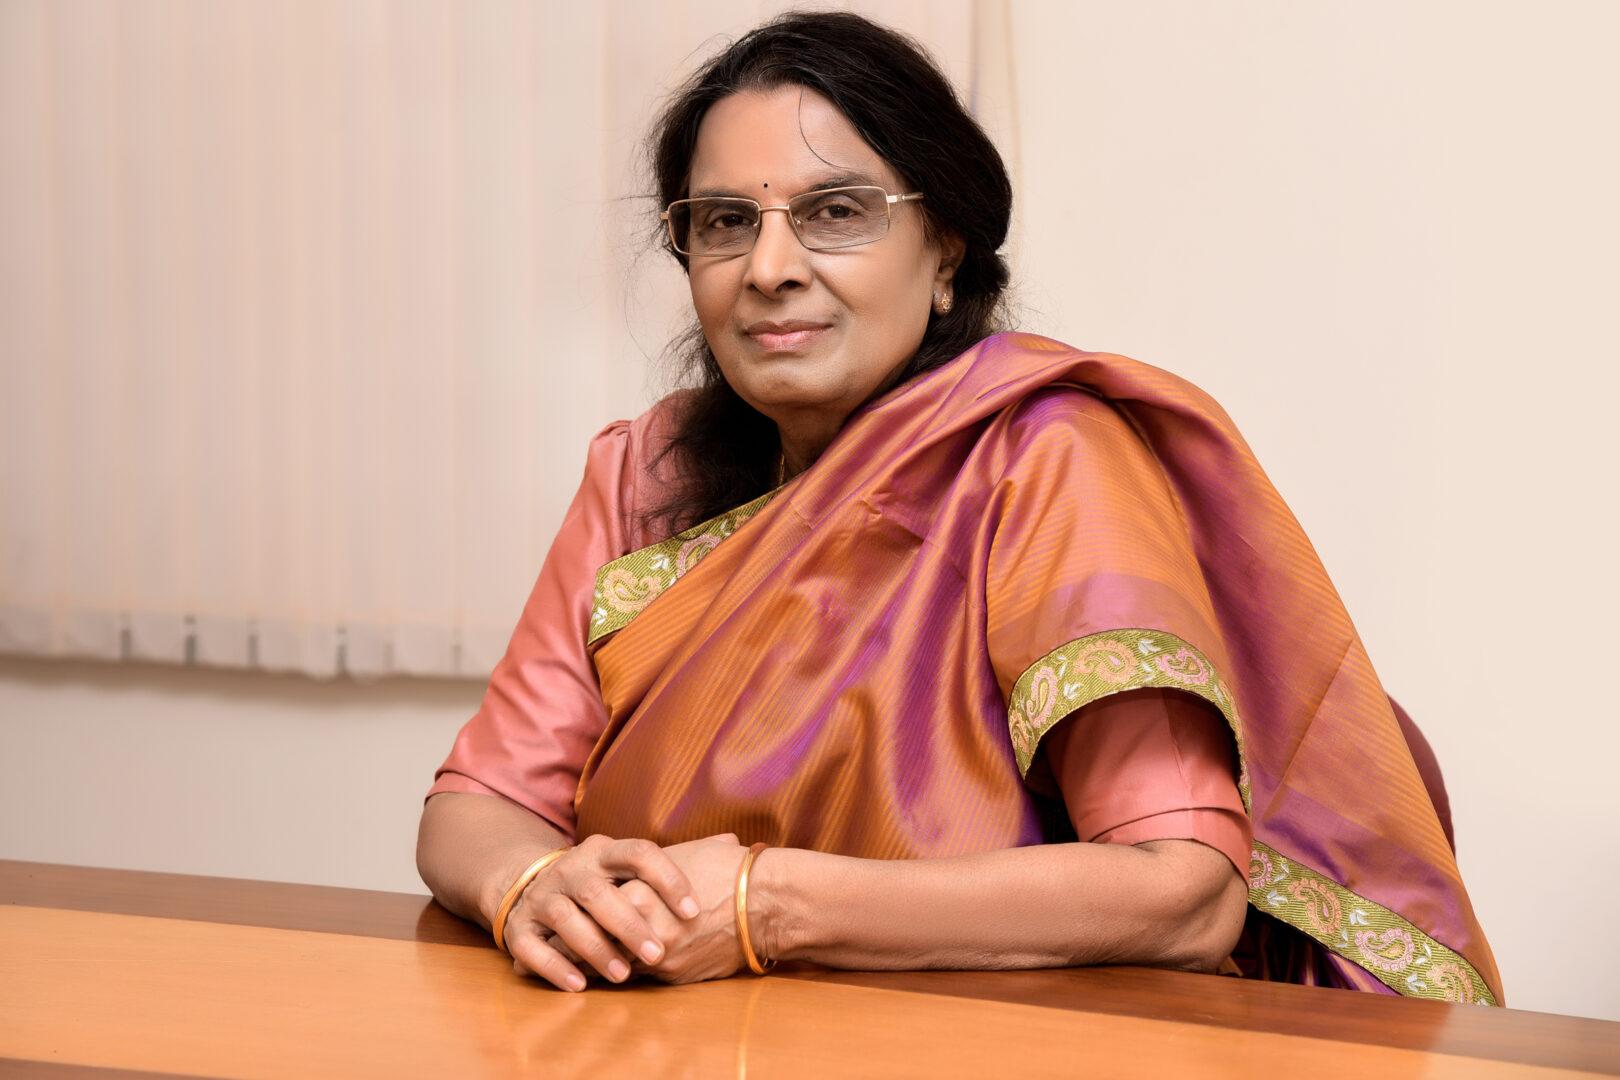 Tmt.Chandradevi Thanikachalam